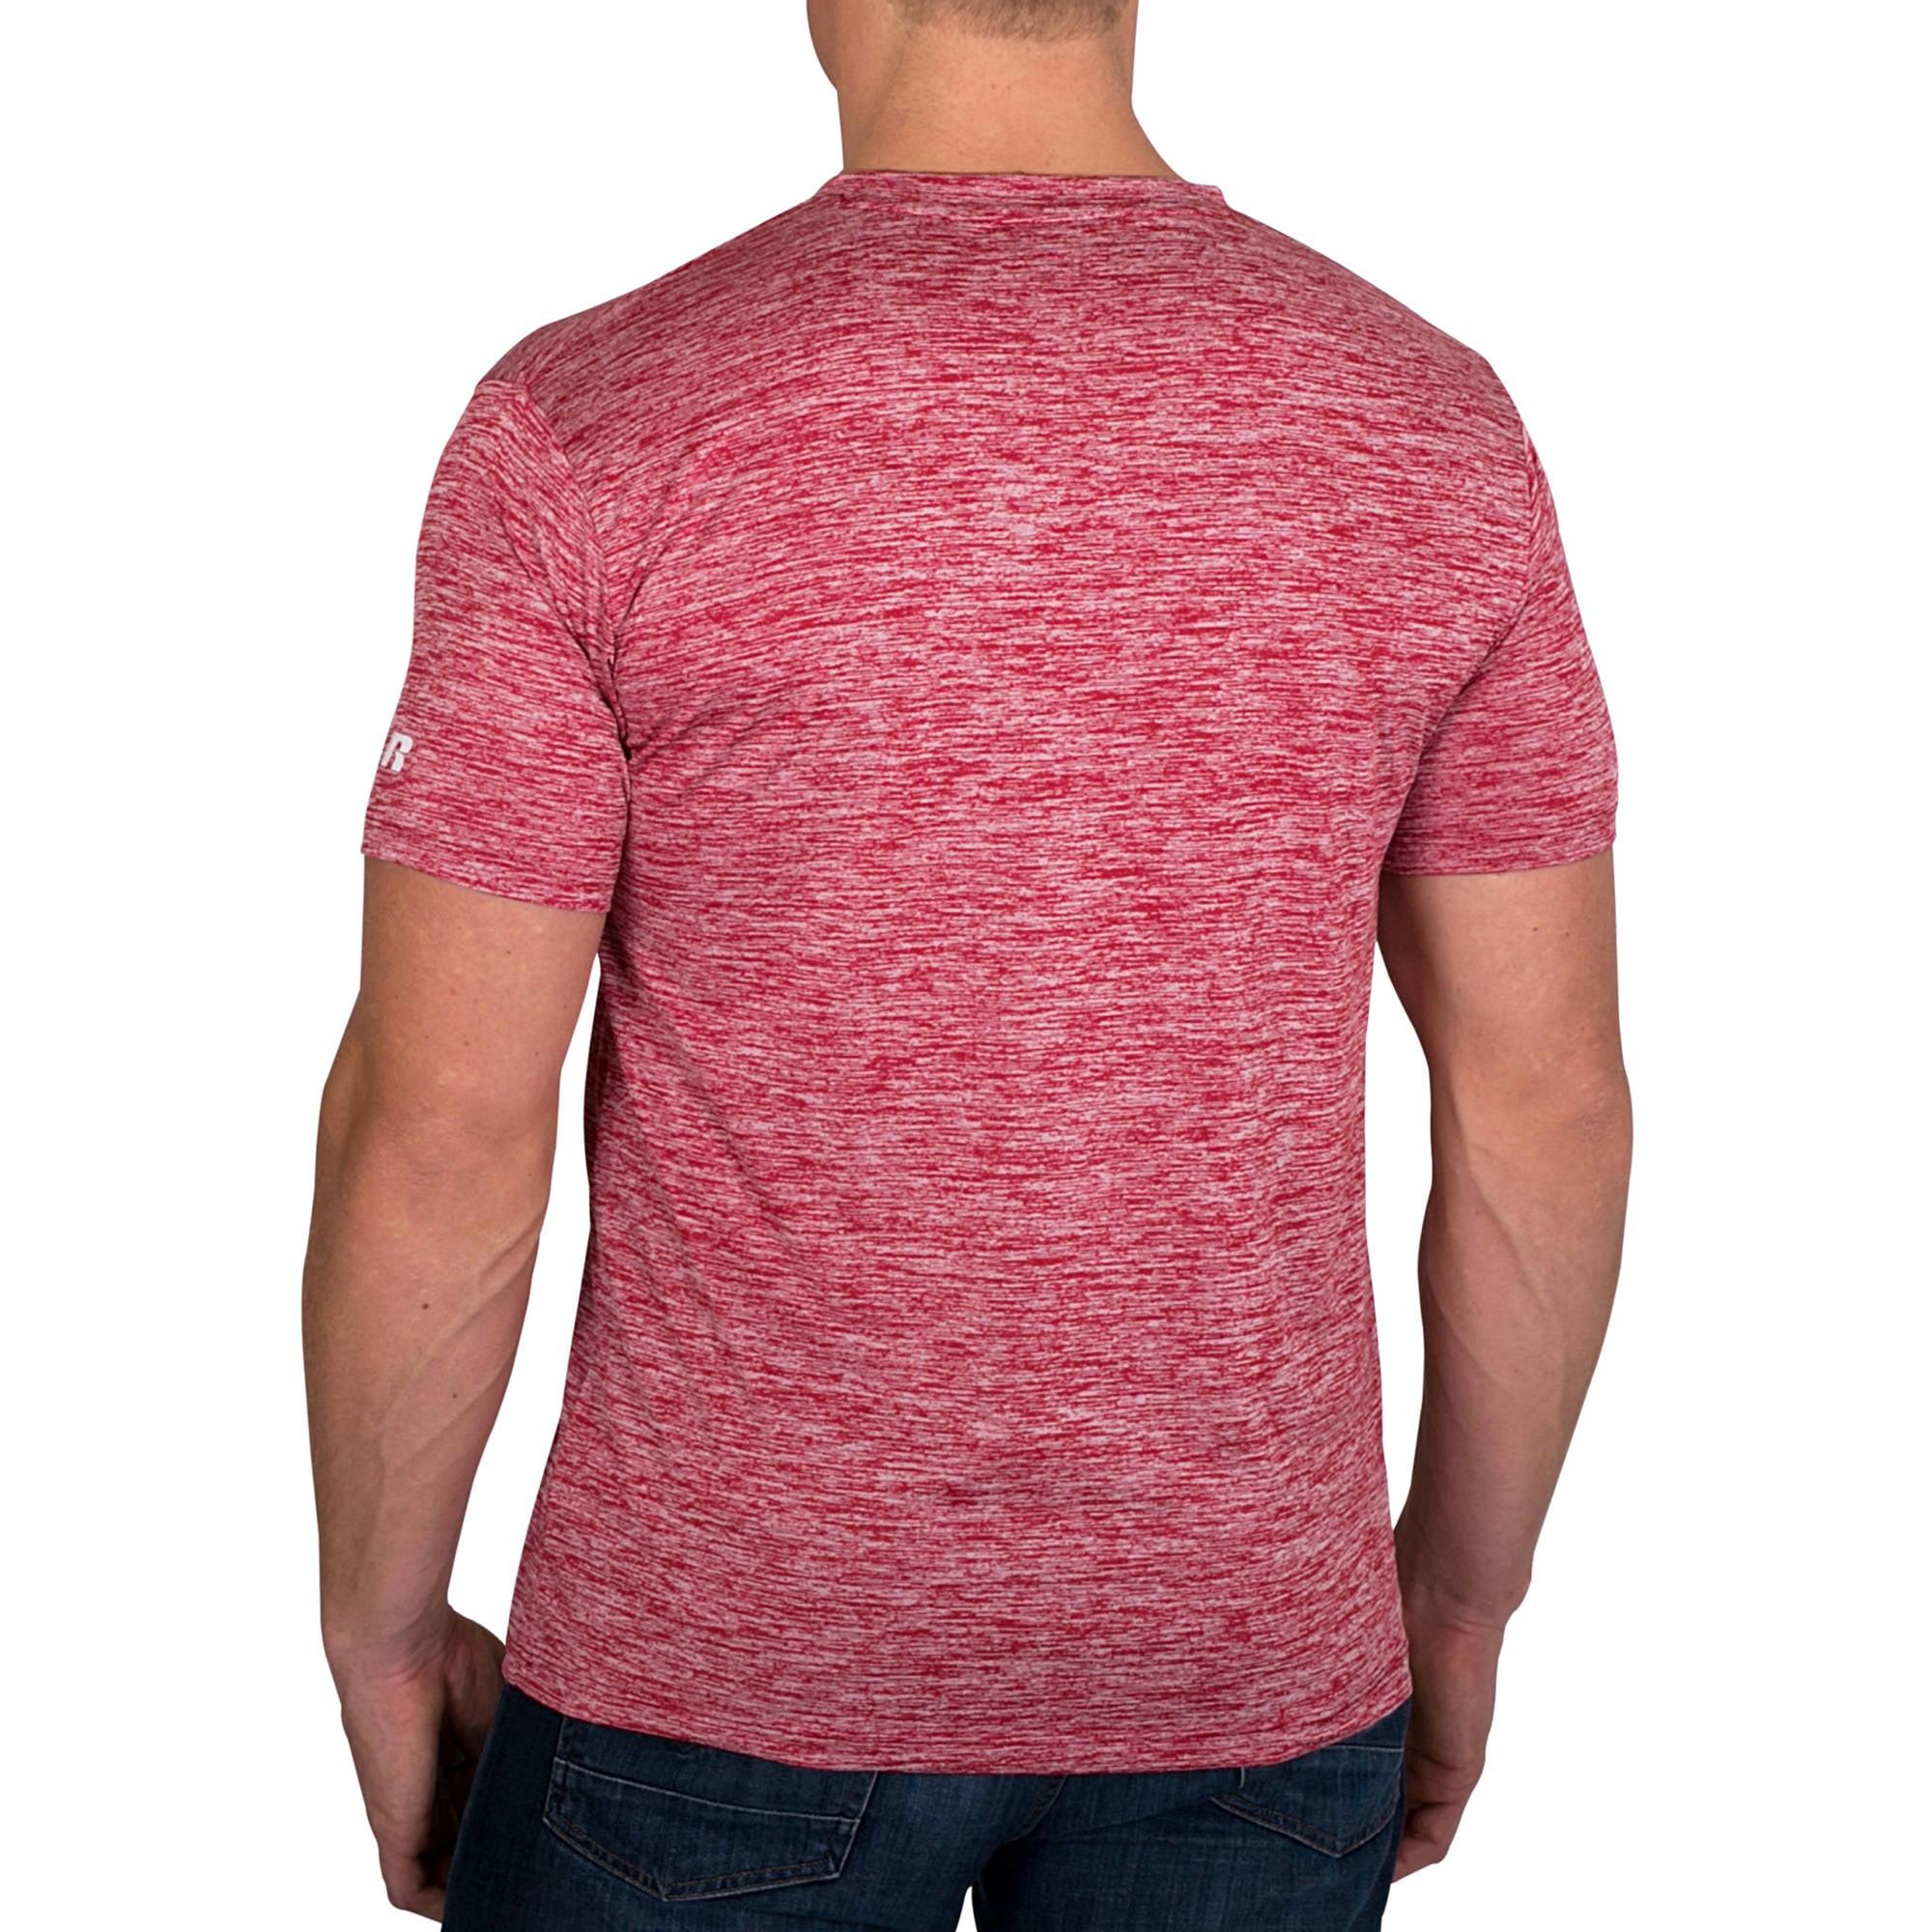 7ca6f2b99 Russell - Russell NCAA Alabama Crimson Tide Men's Impact T-Shirt -  Walmart.com